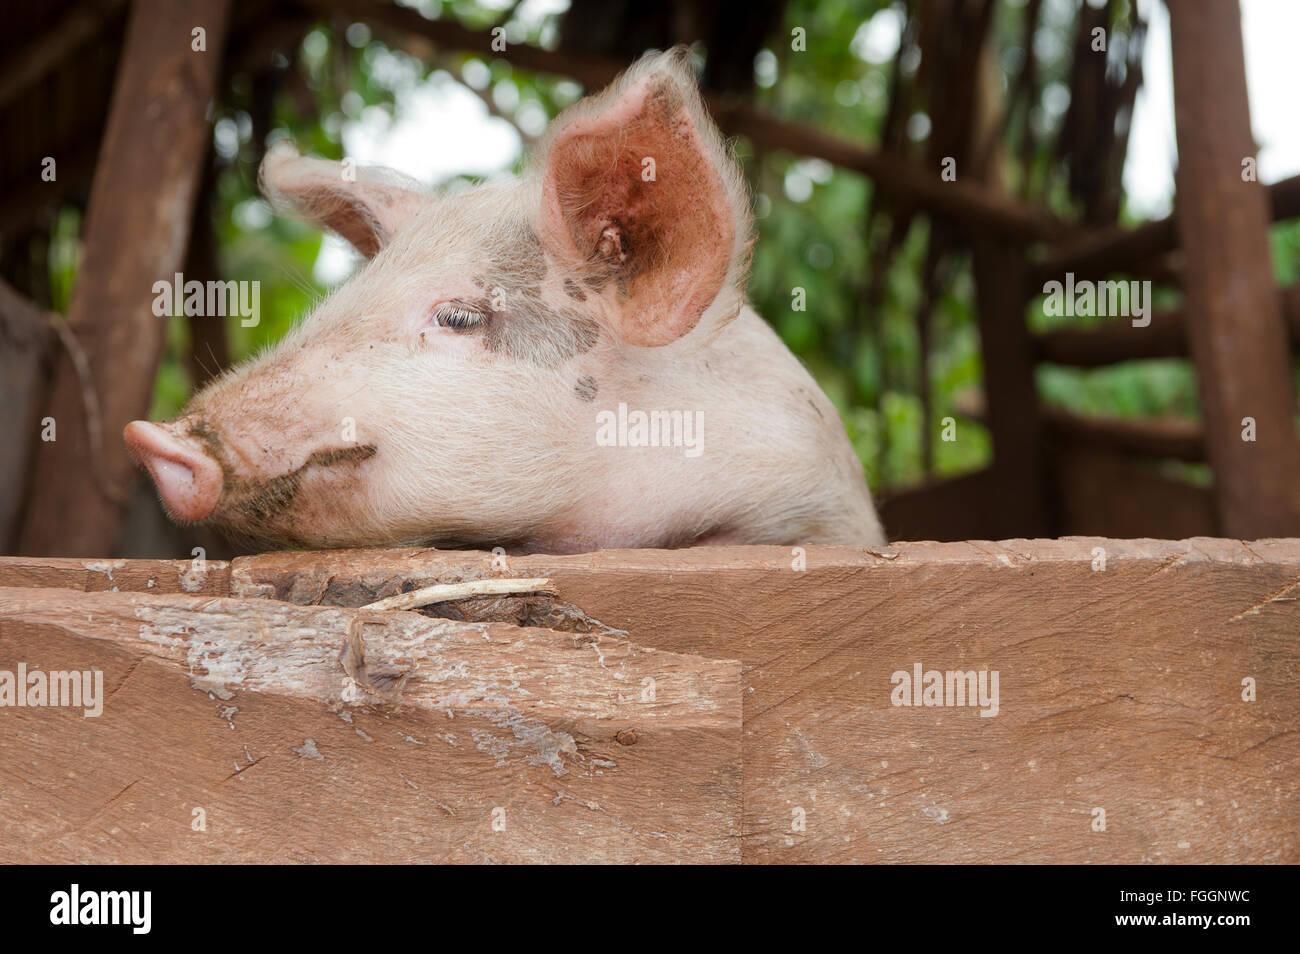 Pig looking over fence. Uganda. - Stock Image